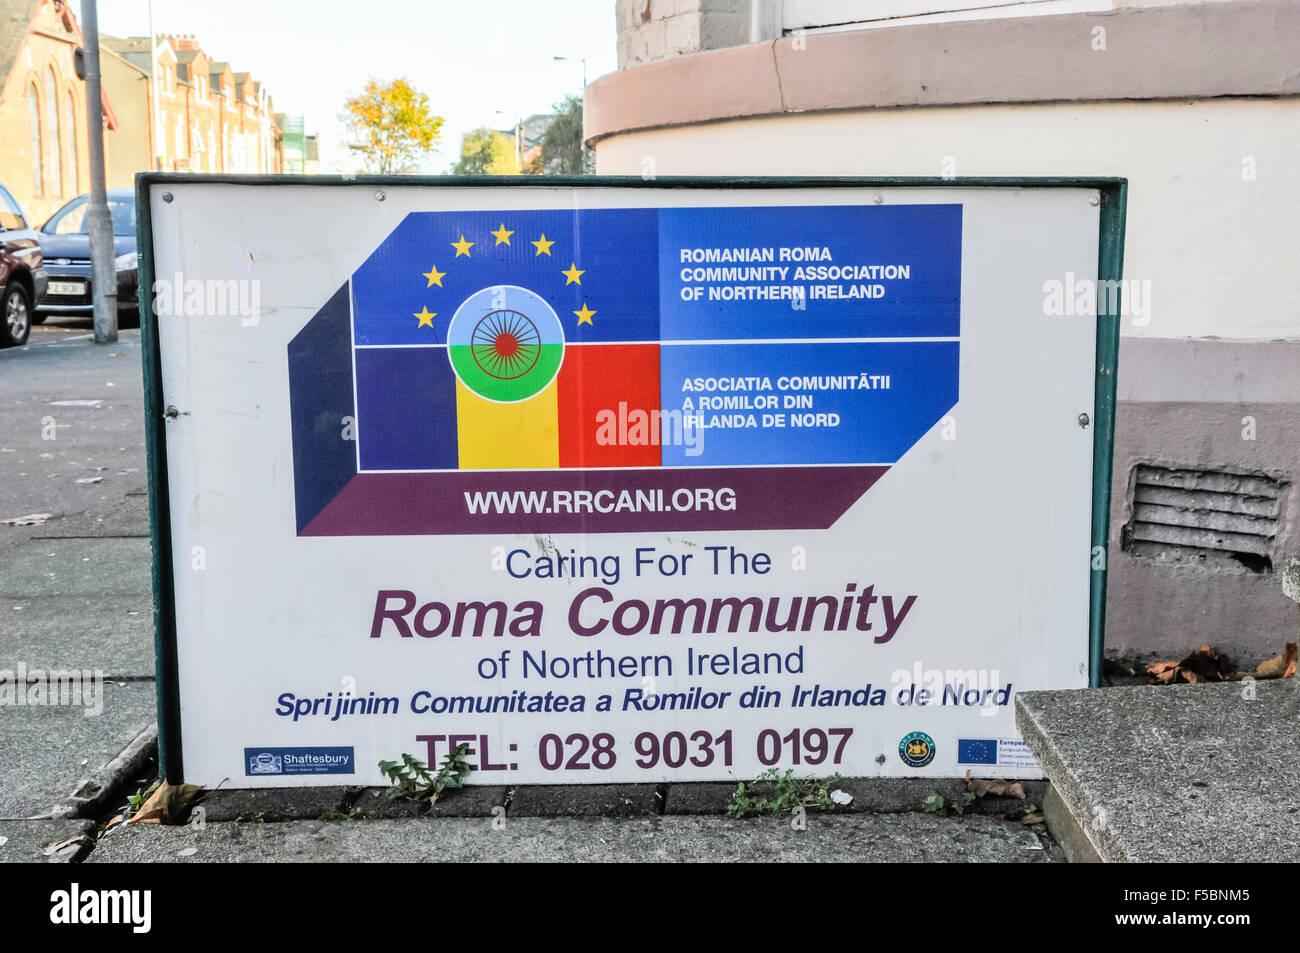 Romanian Roma Community Association of Northern Ireland. - Stock Image